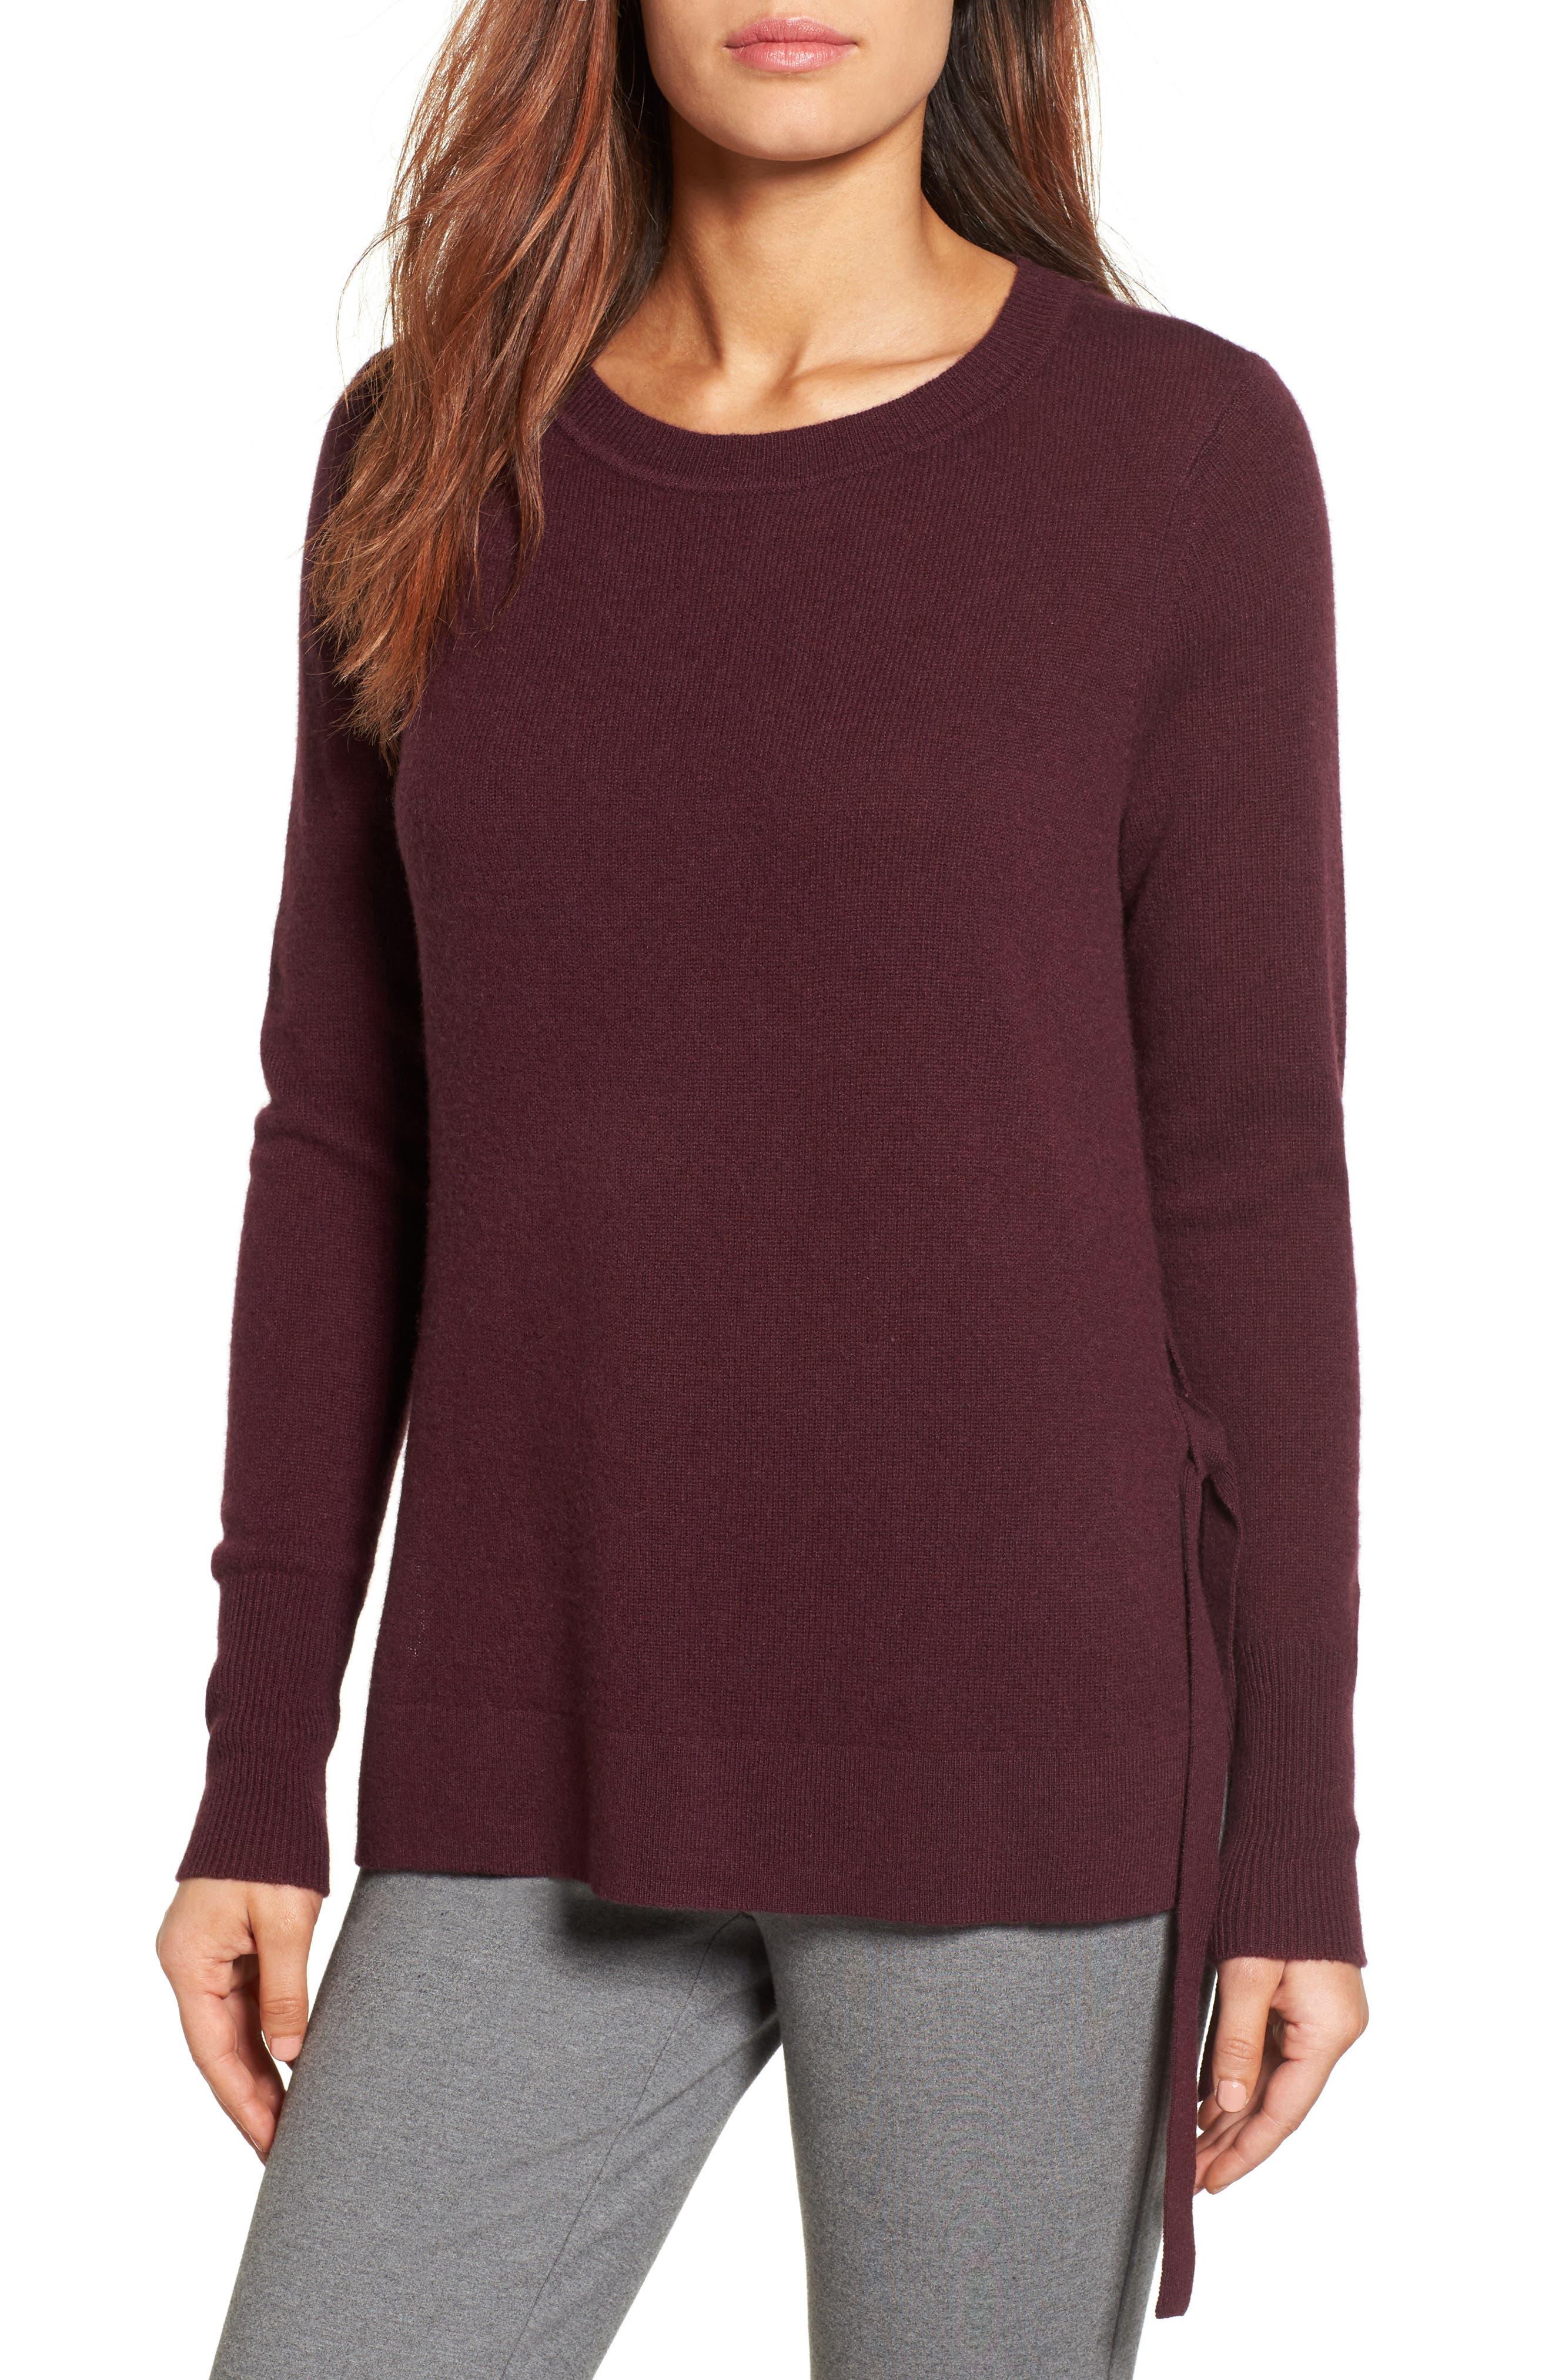 Alternate Image 1 Selected - Halogen® Side Tie Cashmere Sweater (Regular & Petite)